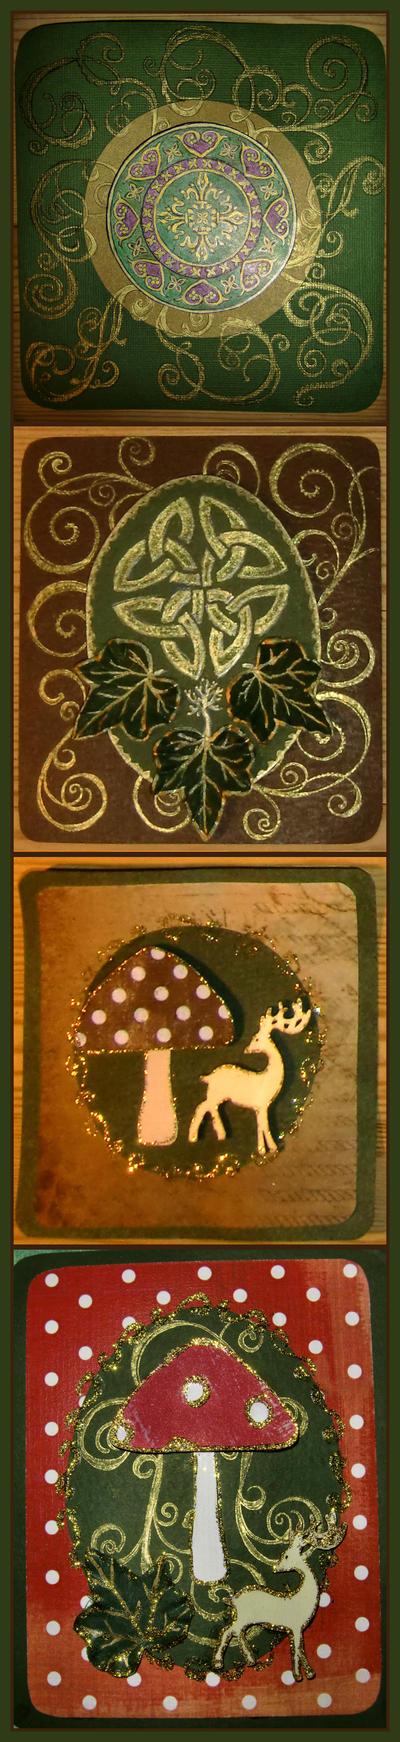 Celtic and Mushroom Yule Cards